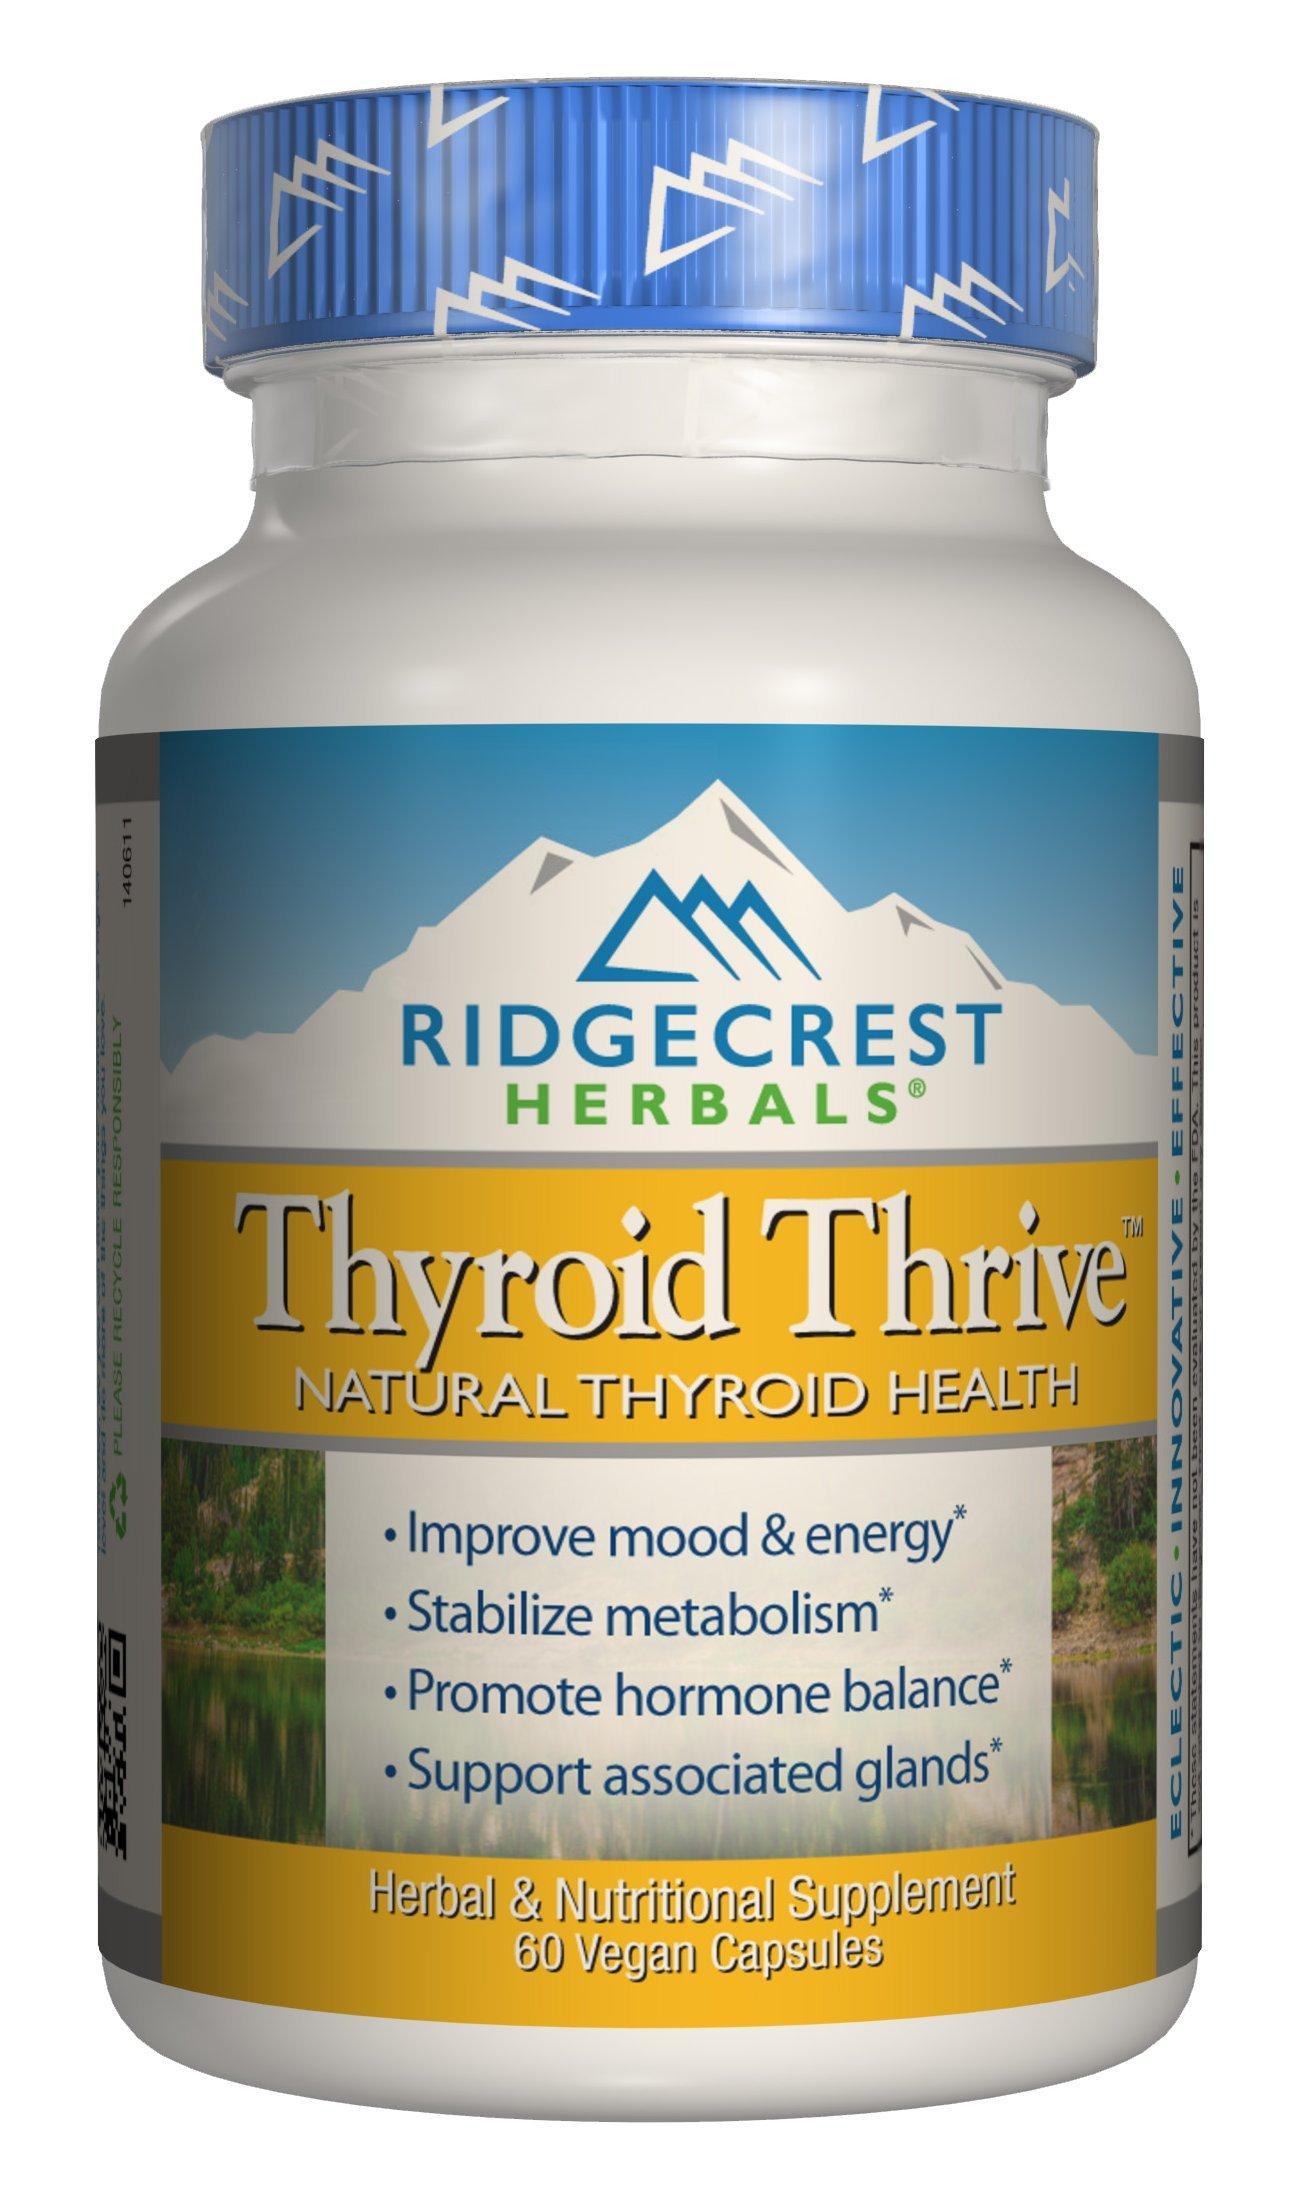 Ridgecrest Herbals Thyroid Thrive, Natural Thyroid Health, 60 Vegetarian Capsules by Ridgecrest Herbals